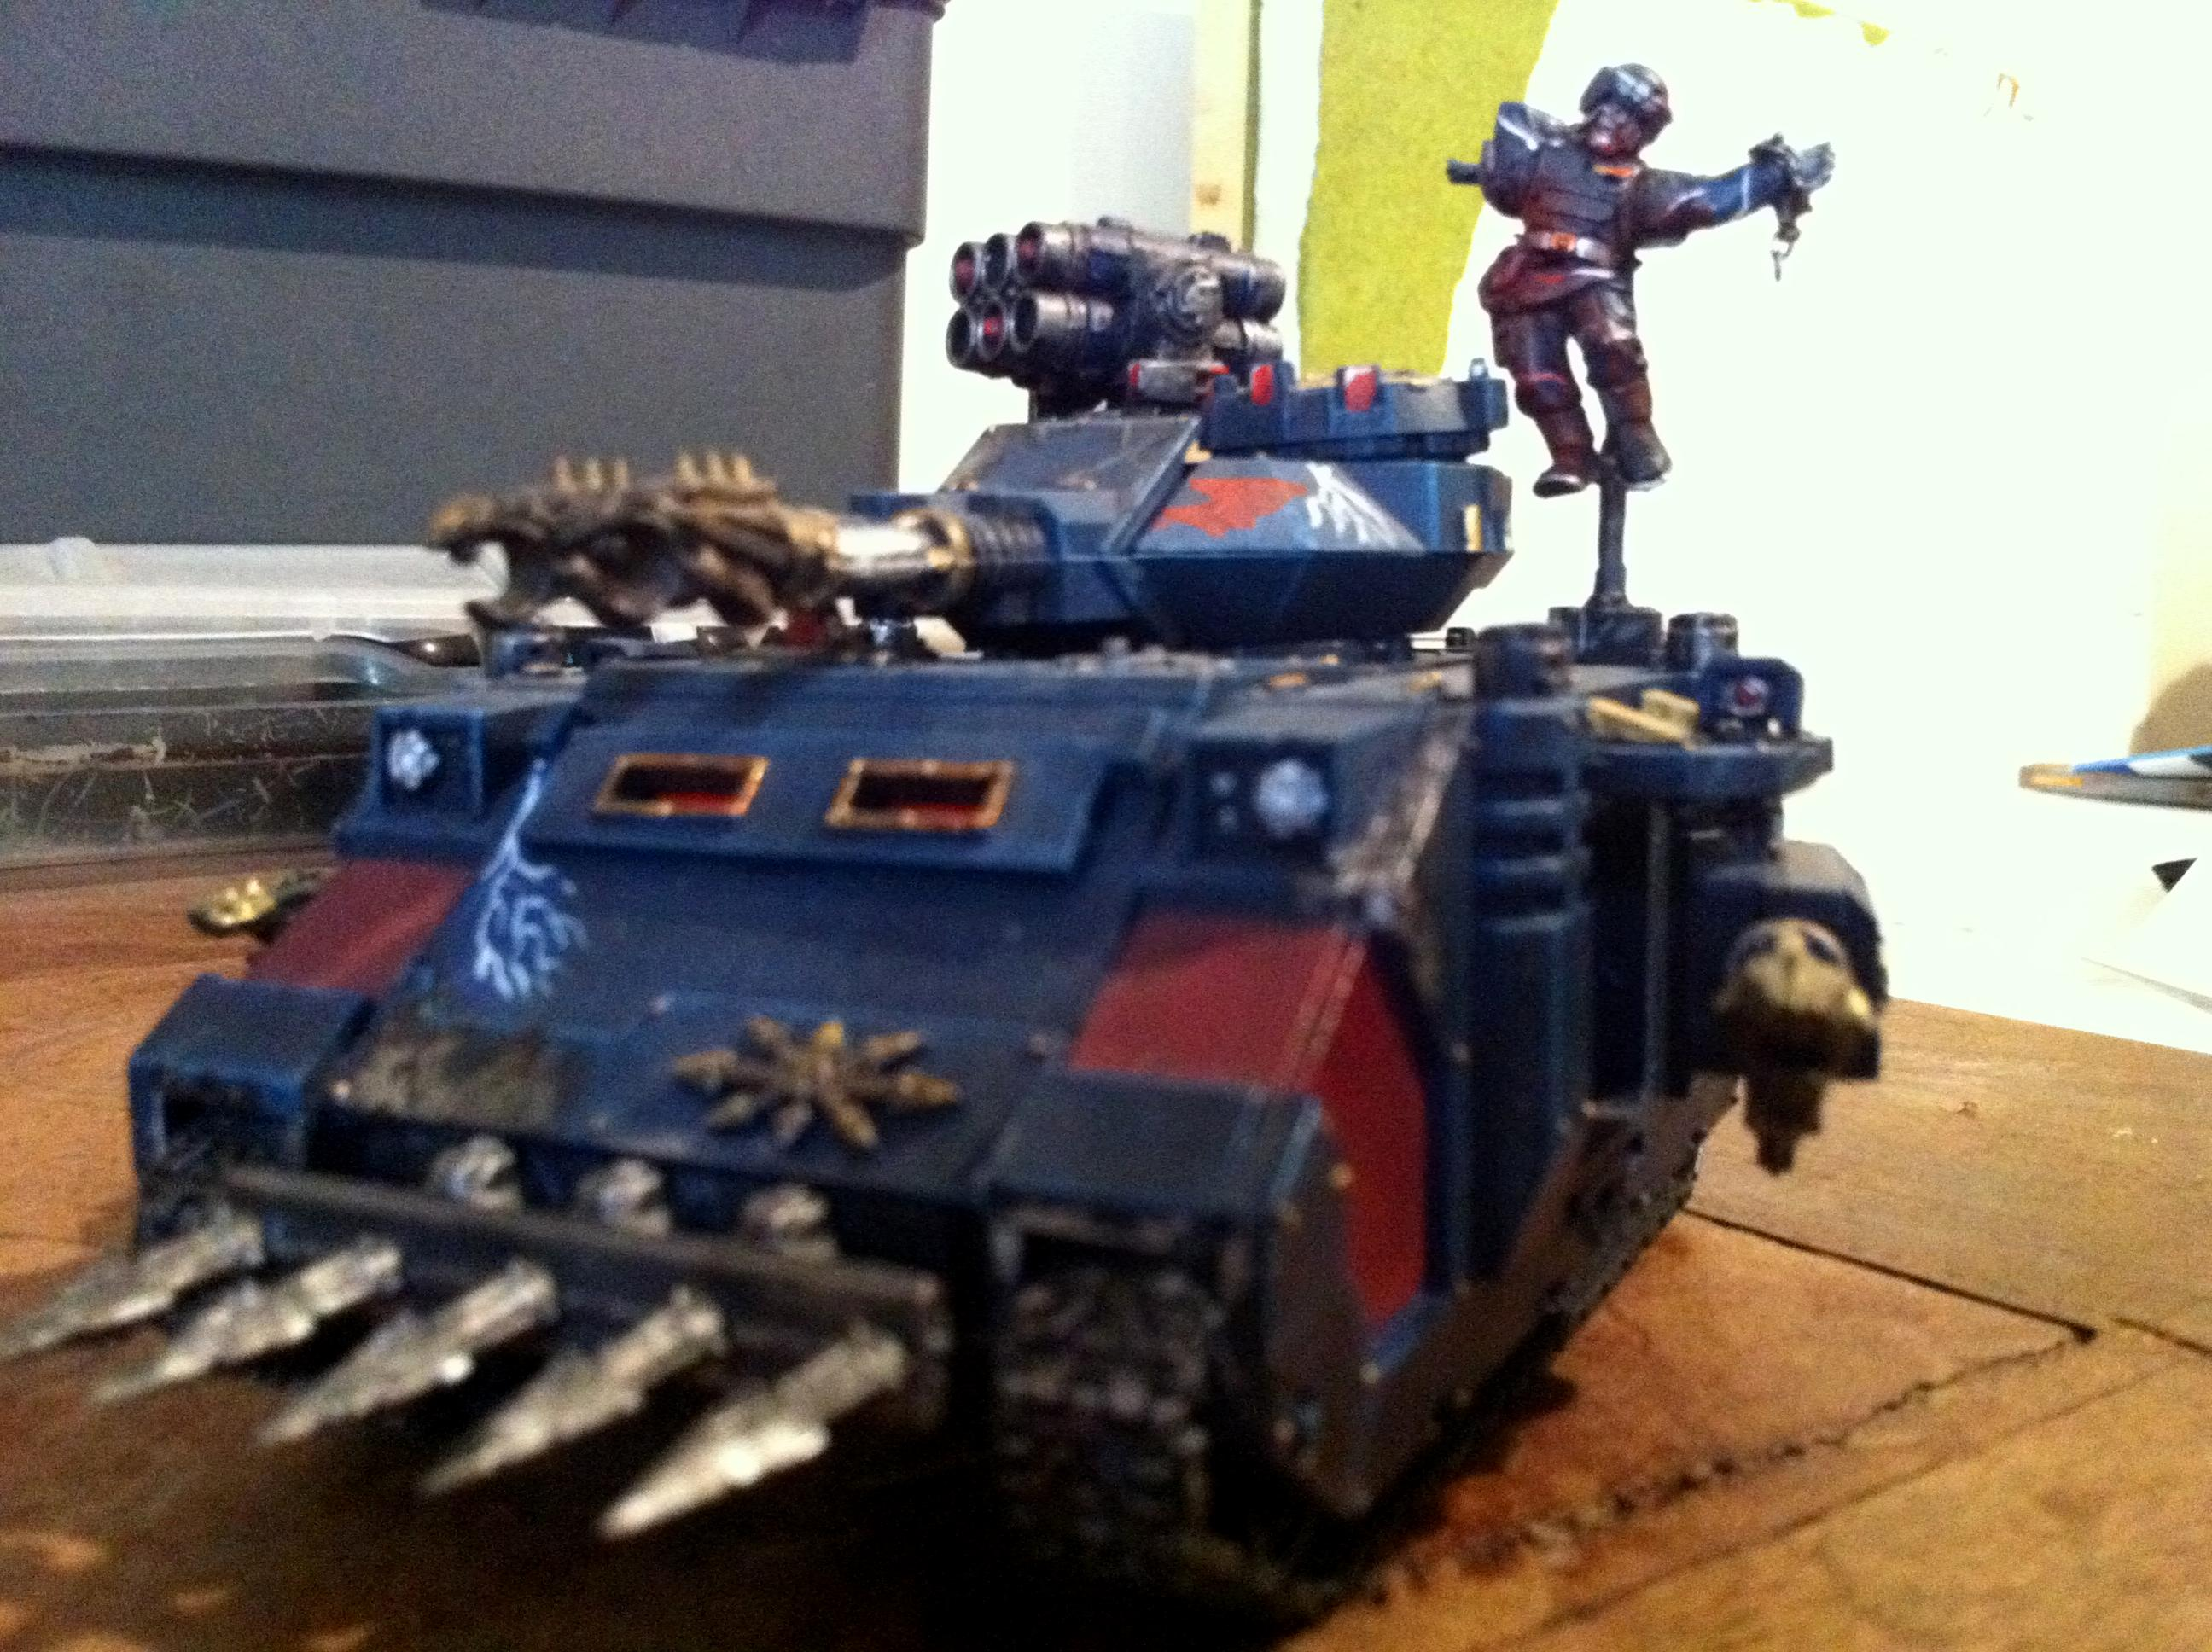 Chaos Space Marines, Guard Abuse, Predator, Warhammer 40,000